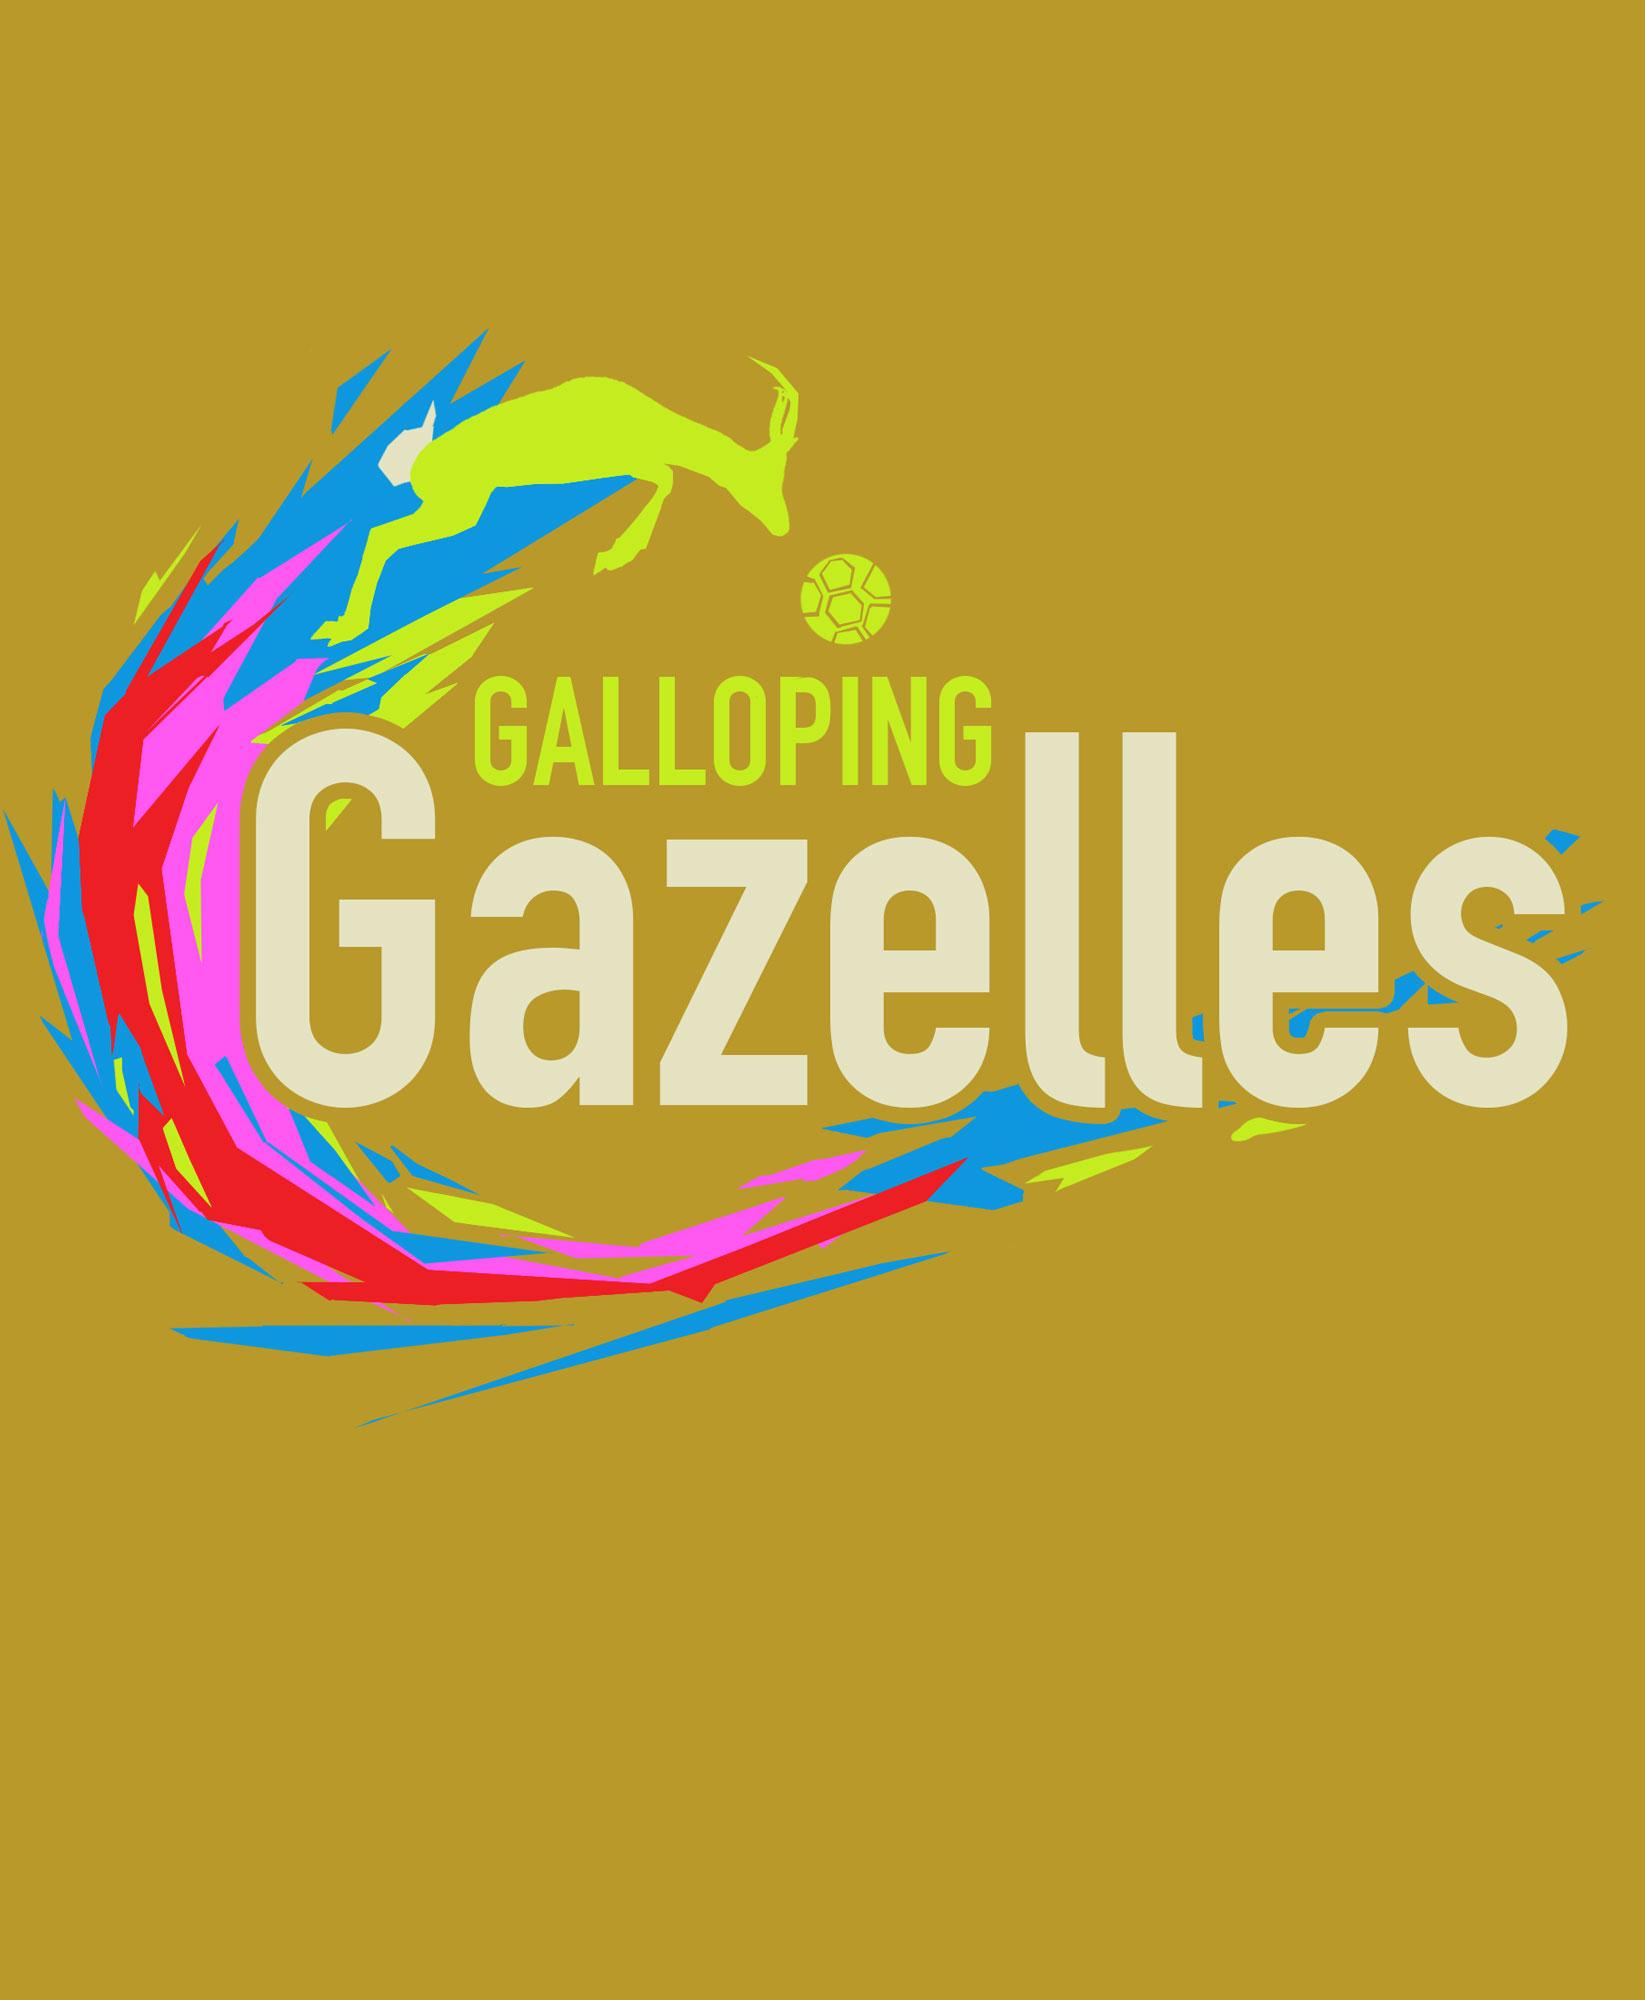 galloping_gazelles_B.jpg